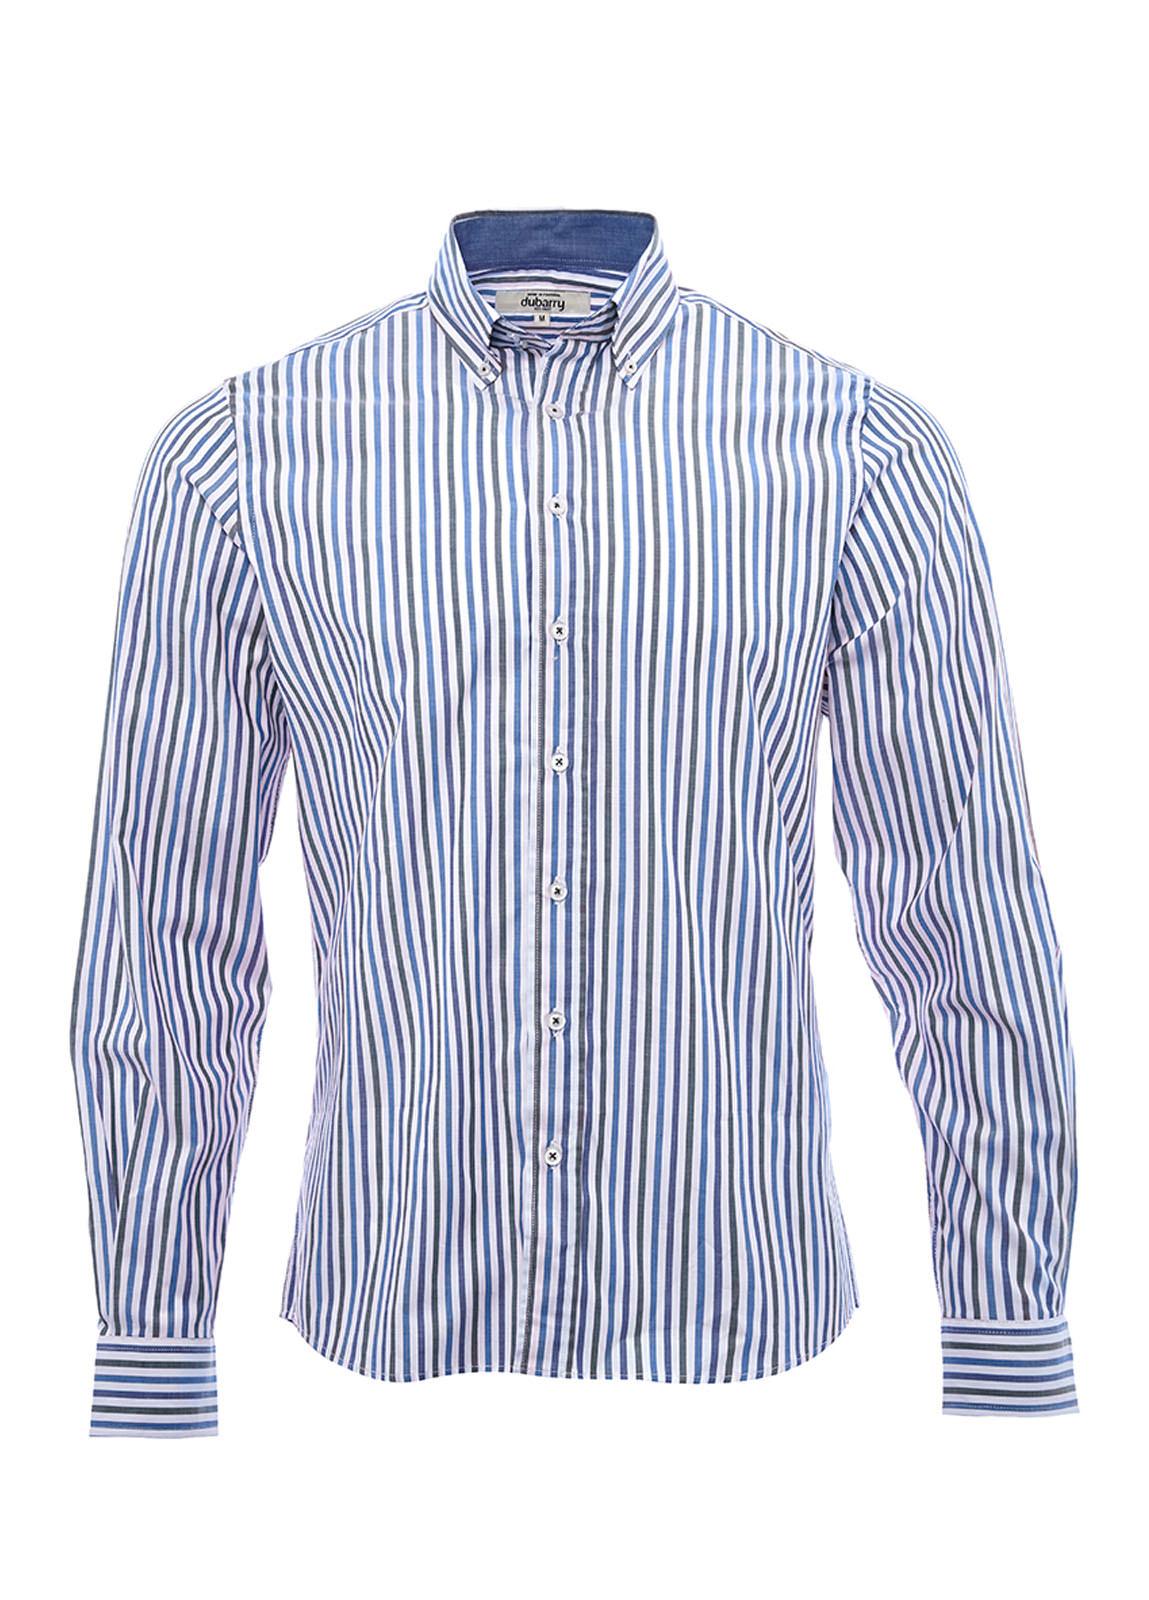 Dubarry_ Kinvara striped shirt - Navy/Bordo_Image_2